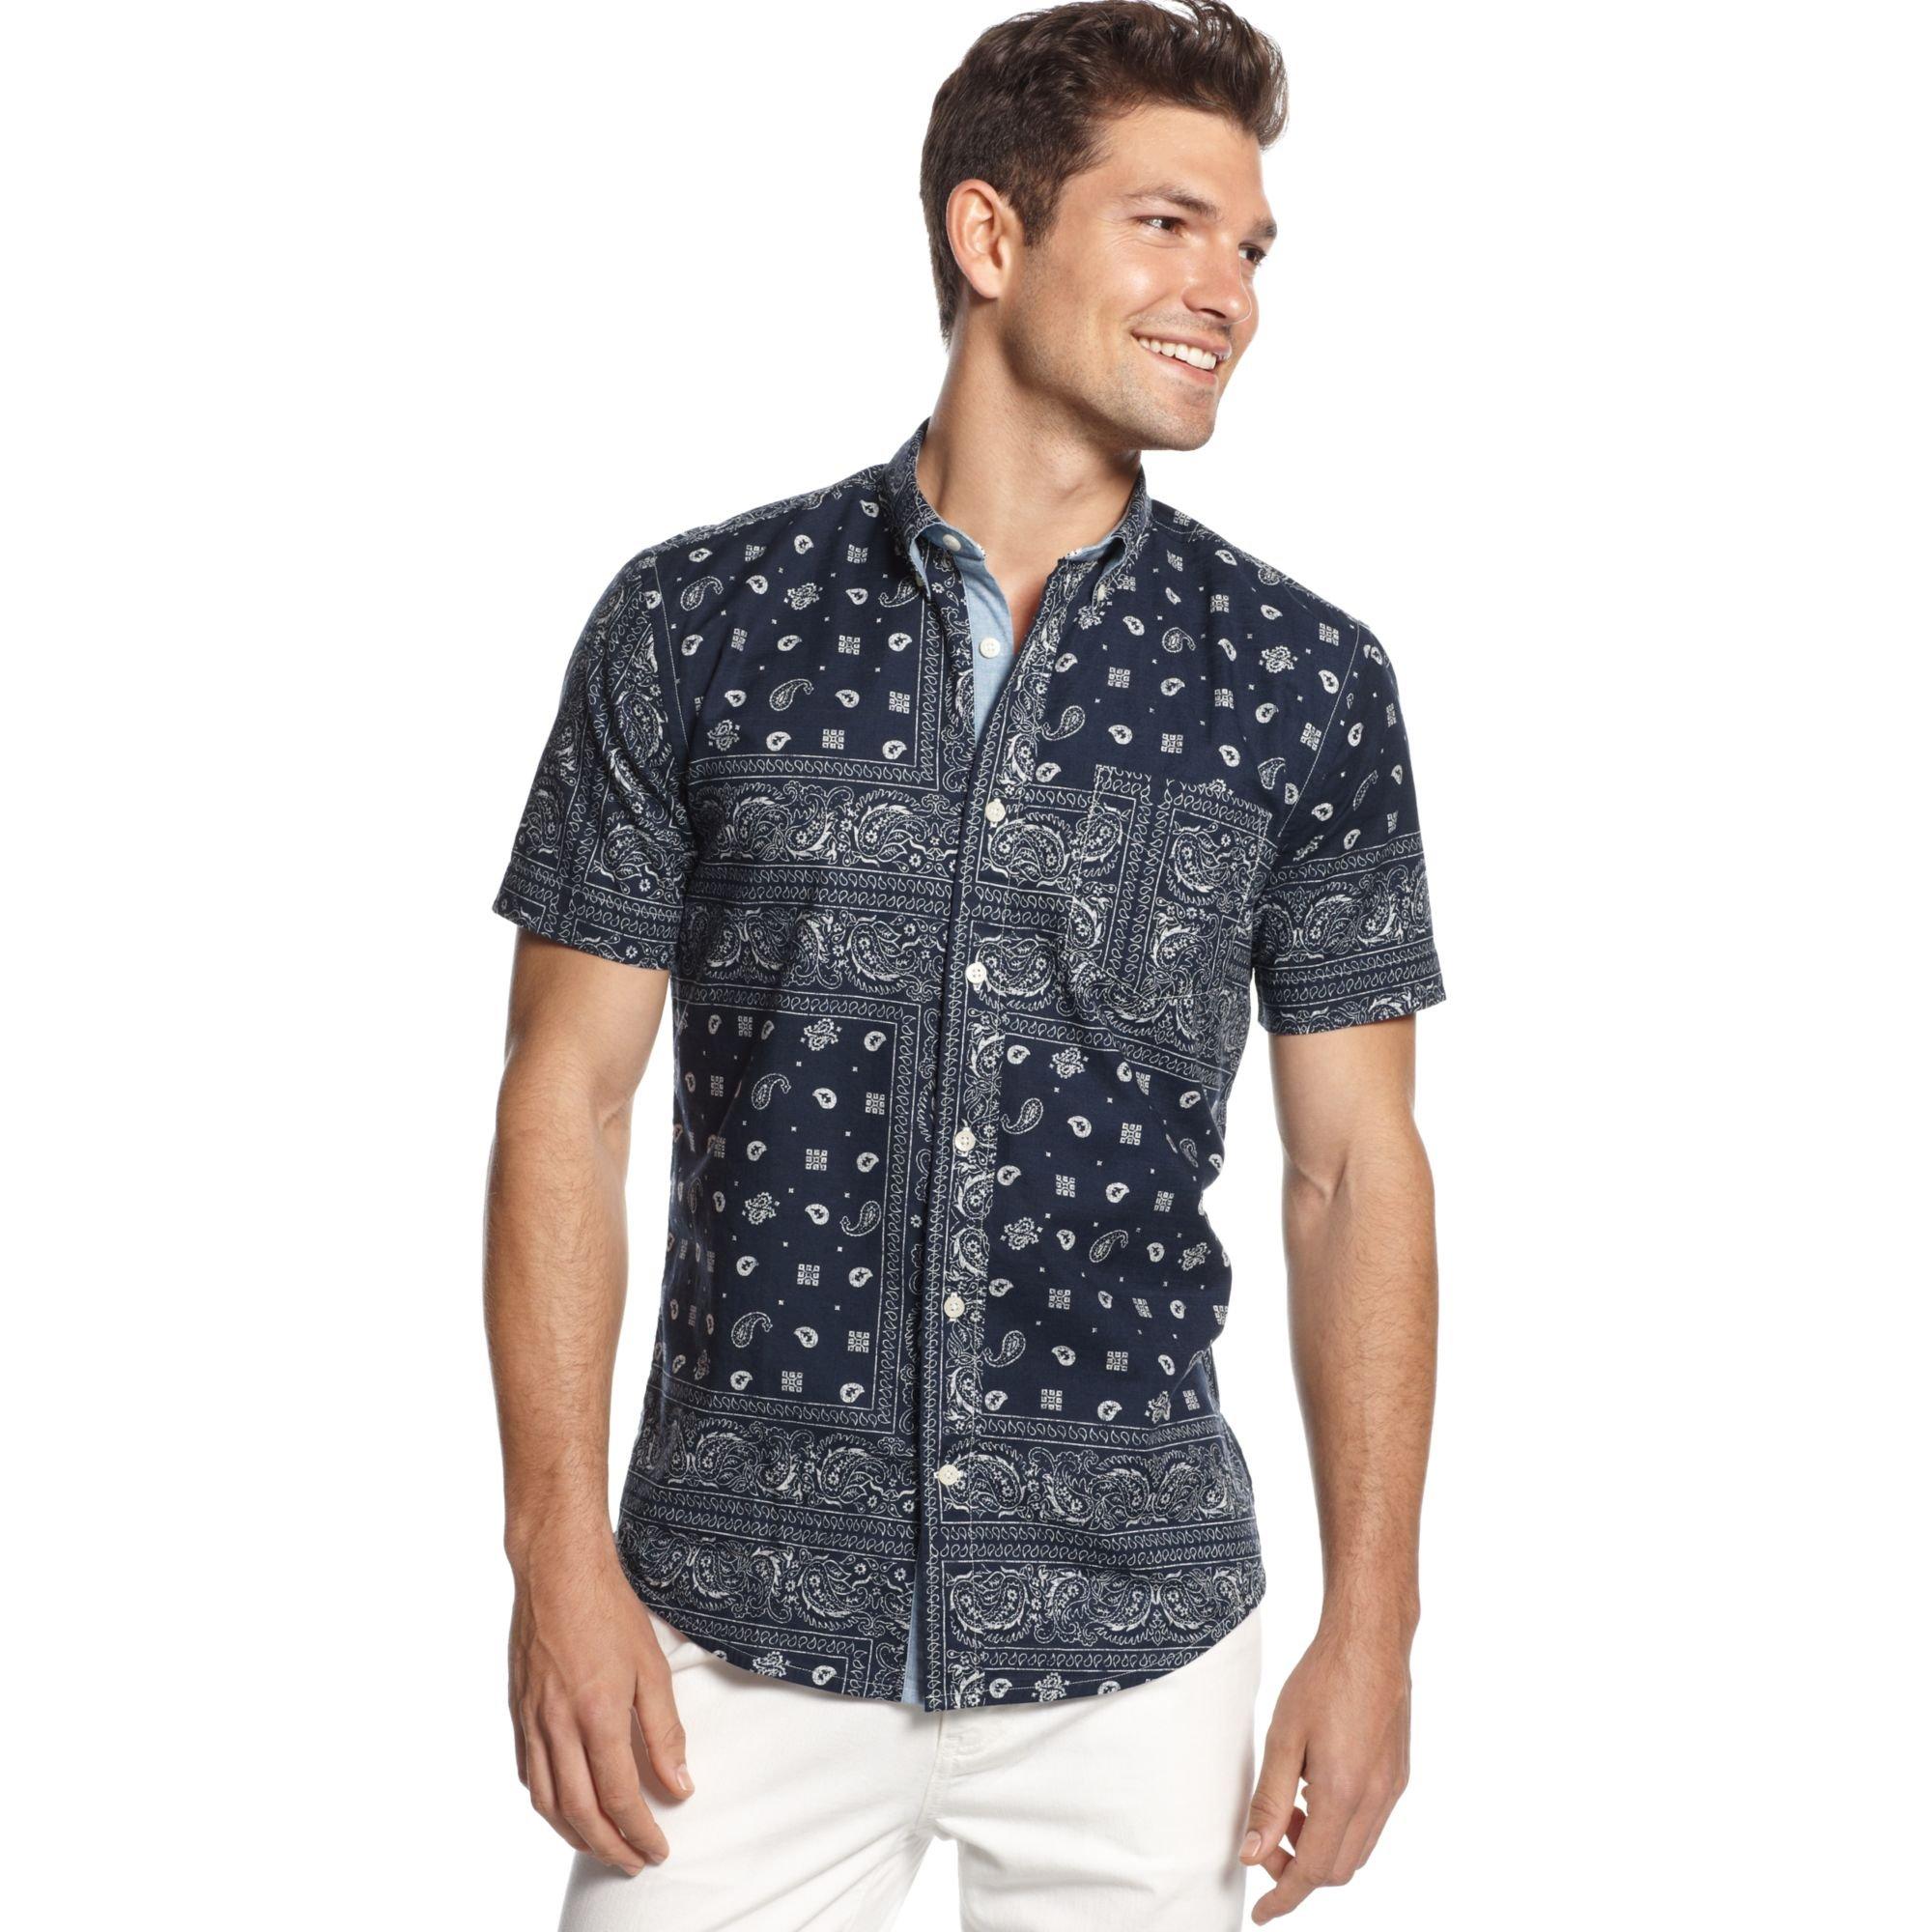 52714a72 Tommy Hilfiger Dean Pieced Bandana Customfit Shirt in Blue for Men ...